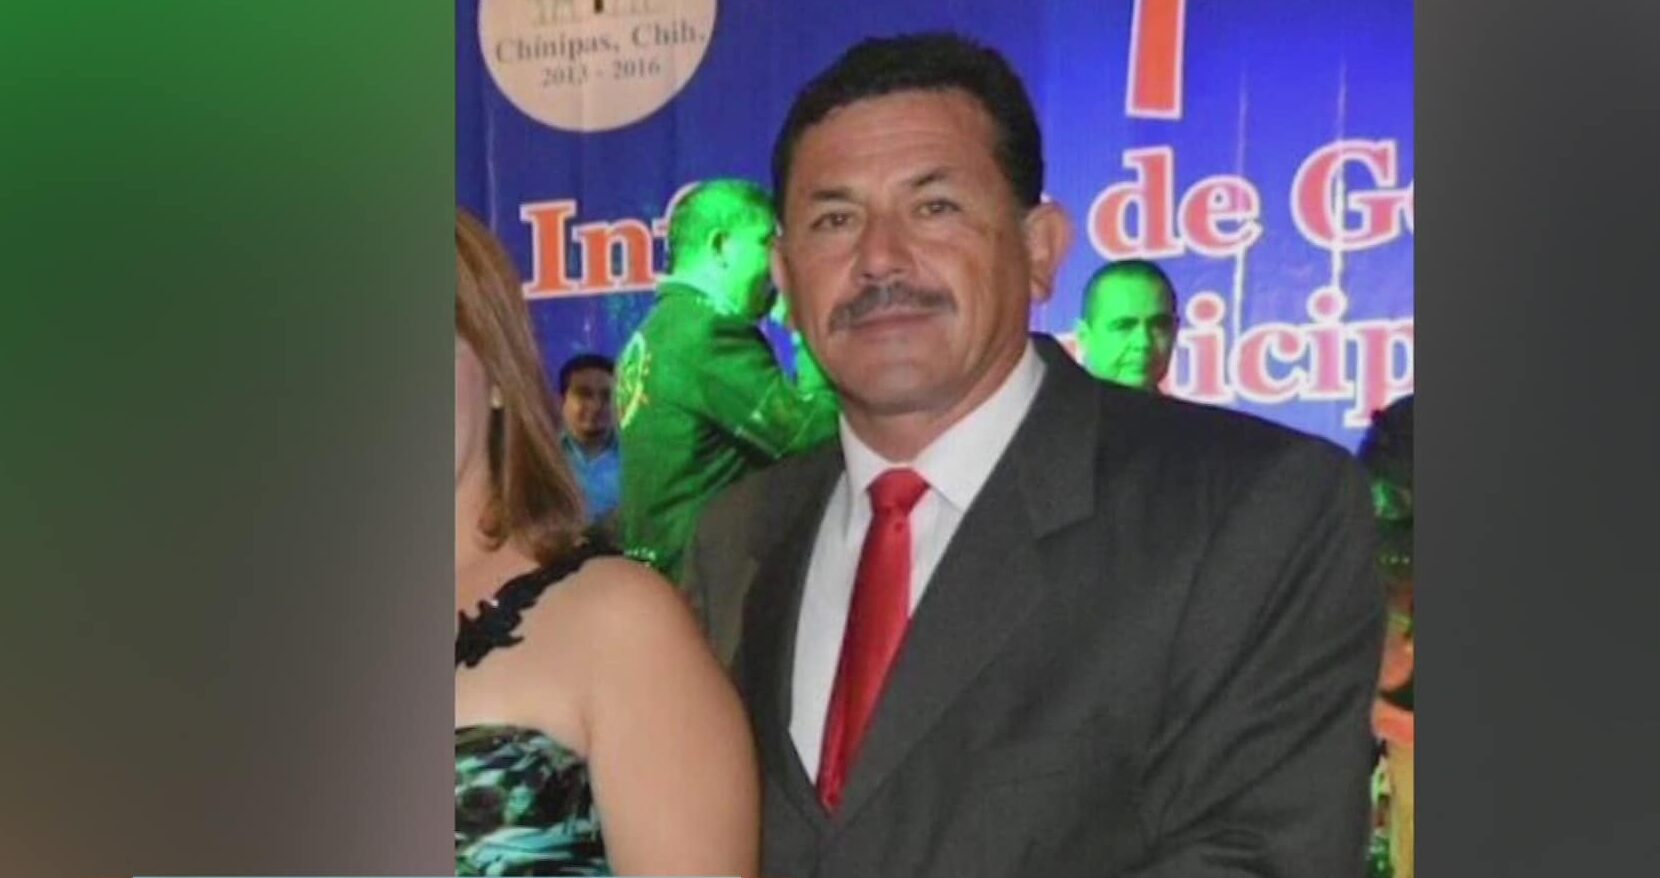 8 anos de carcel a exalcalde de chinipas chihuahua por homicidio de miroslava breach